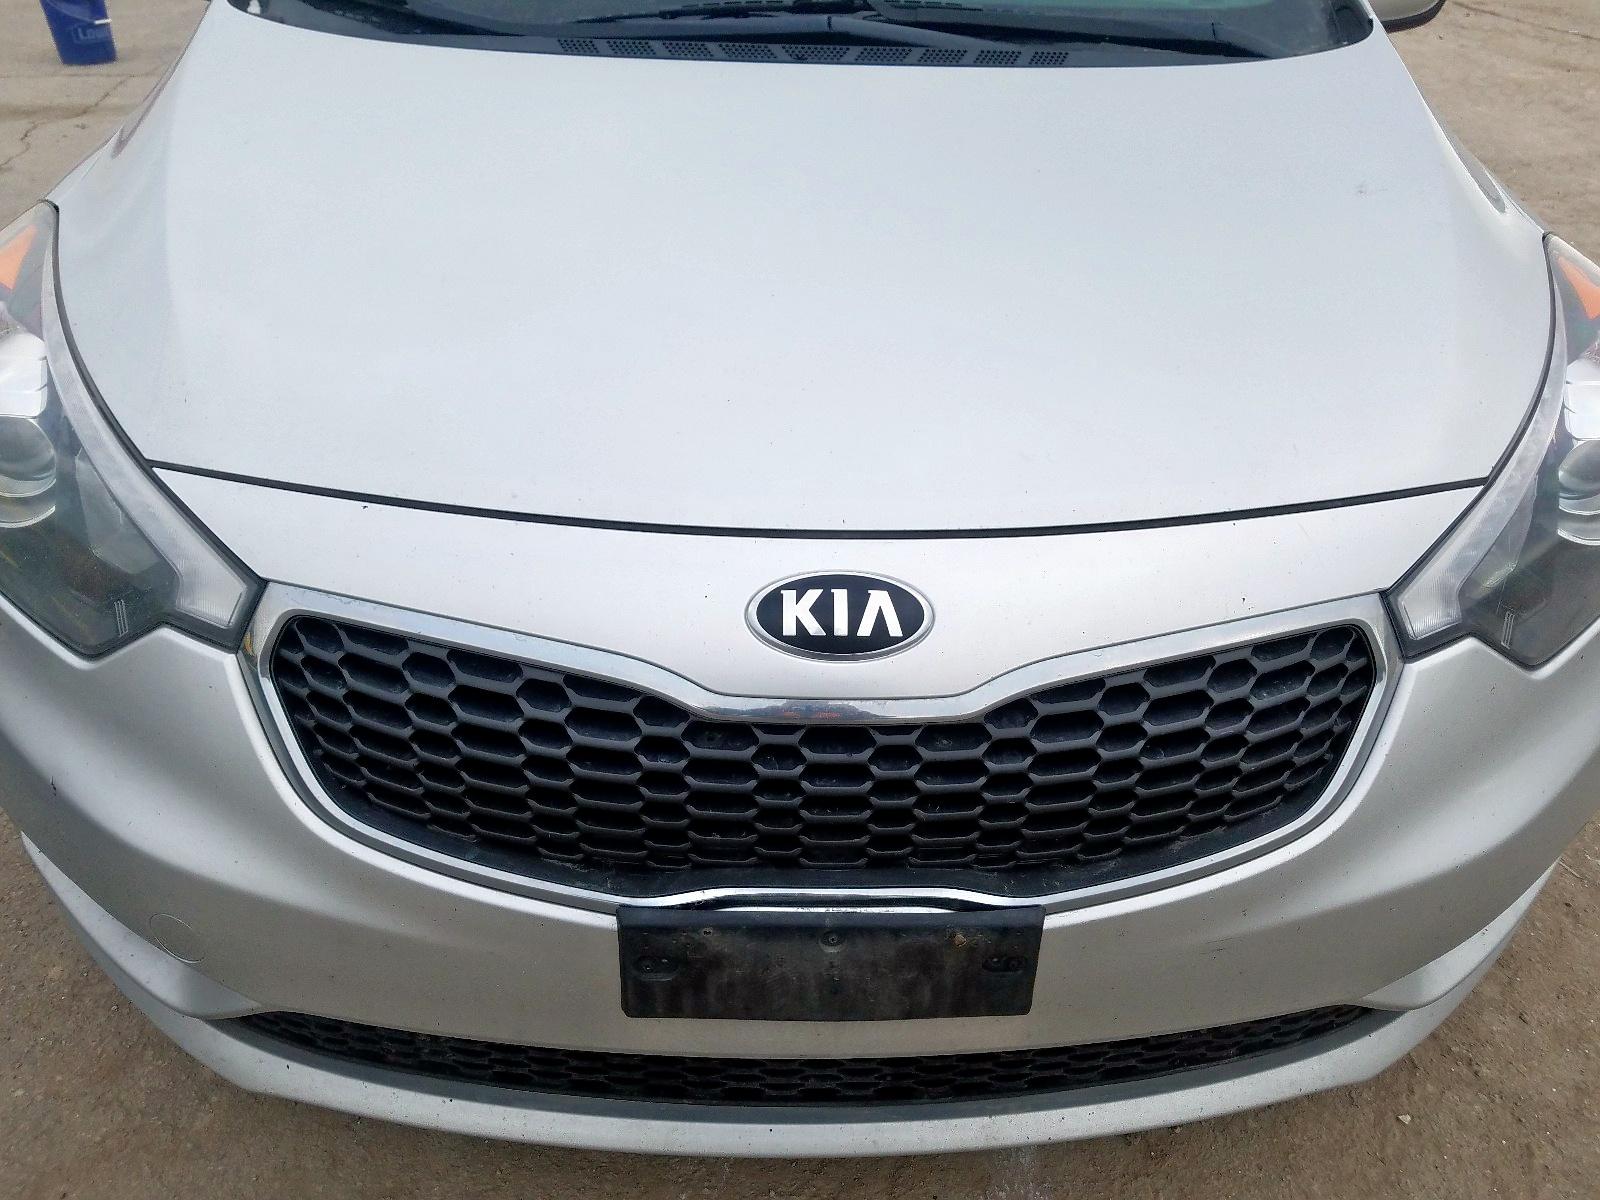 KNAFX4A81E5207960 - 2014 Kia Forte Ex 2.0L engine view